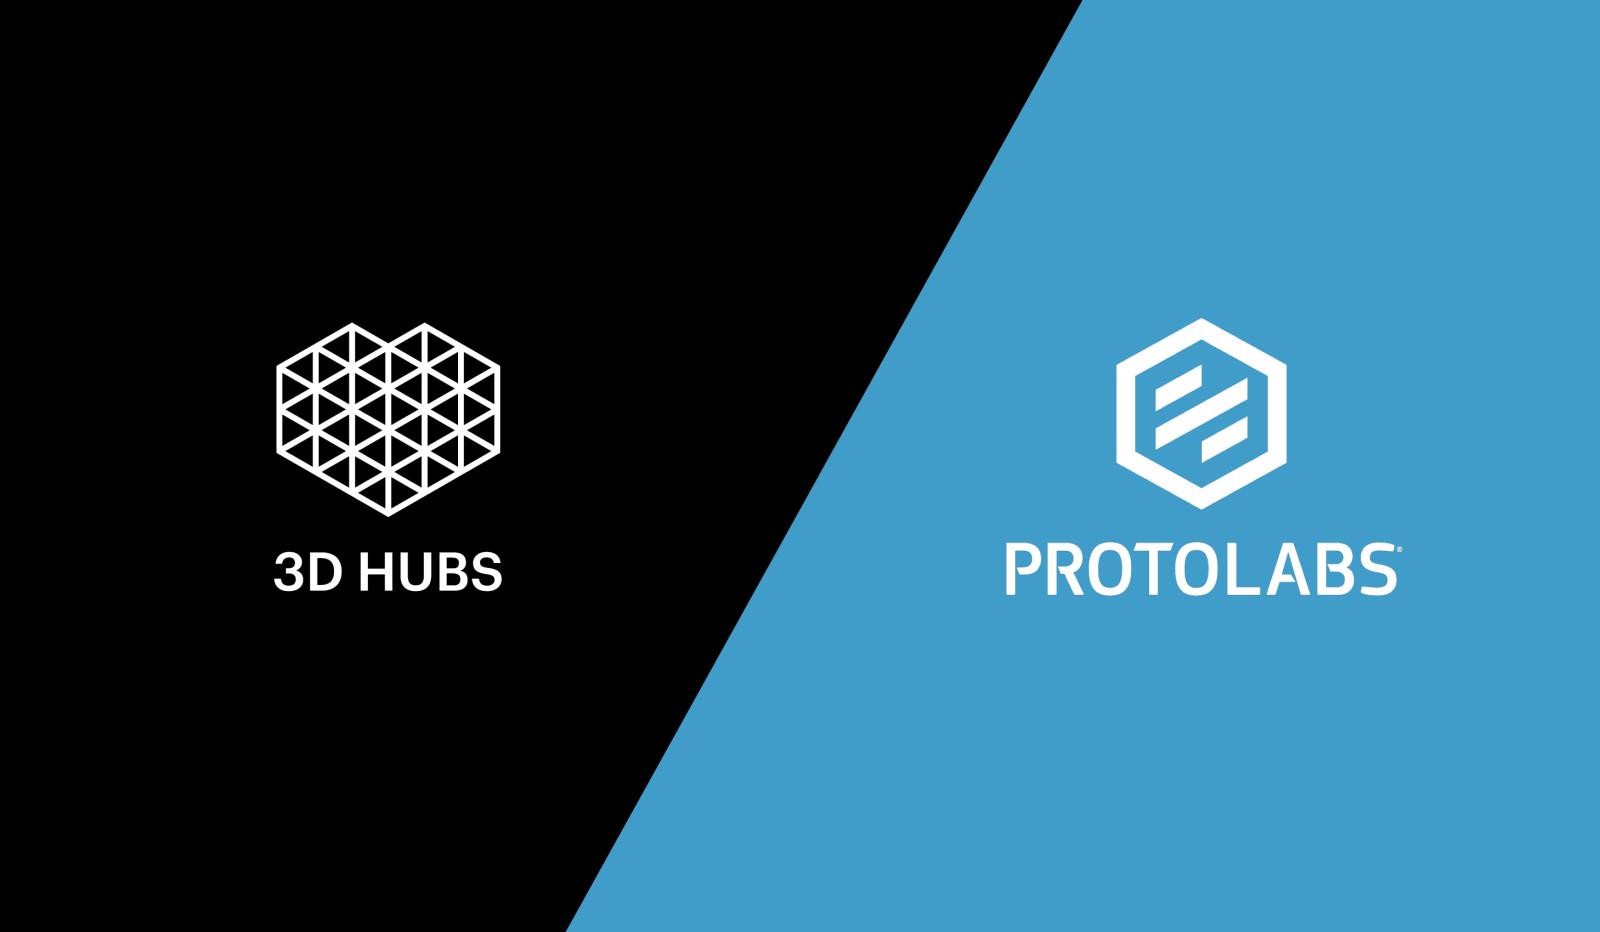 Protolabs 3DHubs